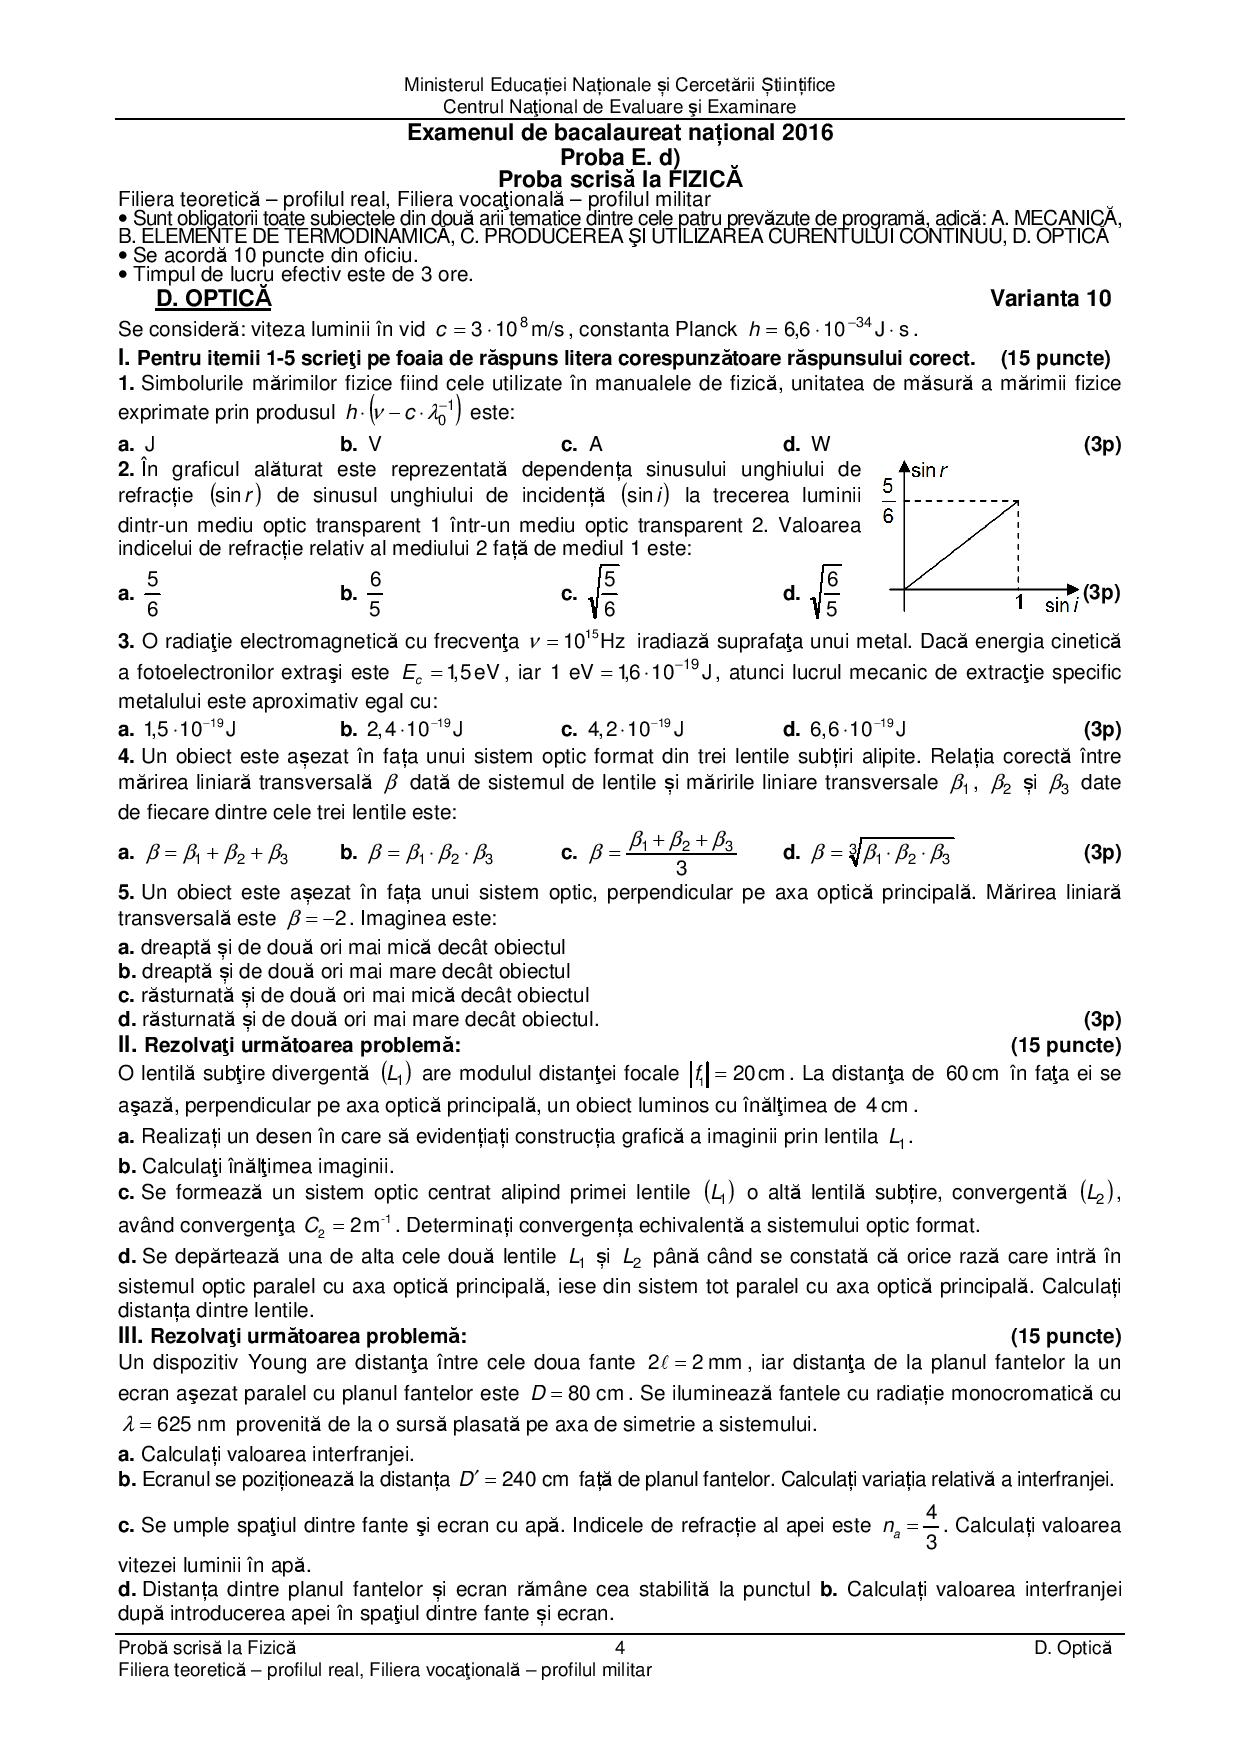 E_d_fizica_teoretic_vocational_2016_var_10_LRO-page-004